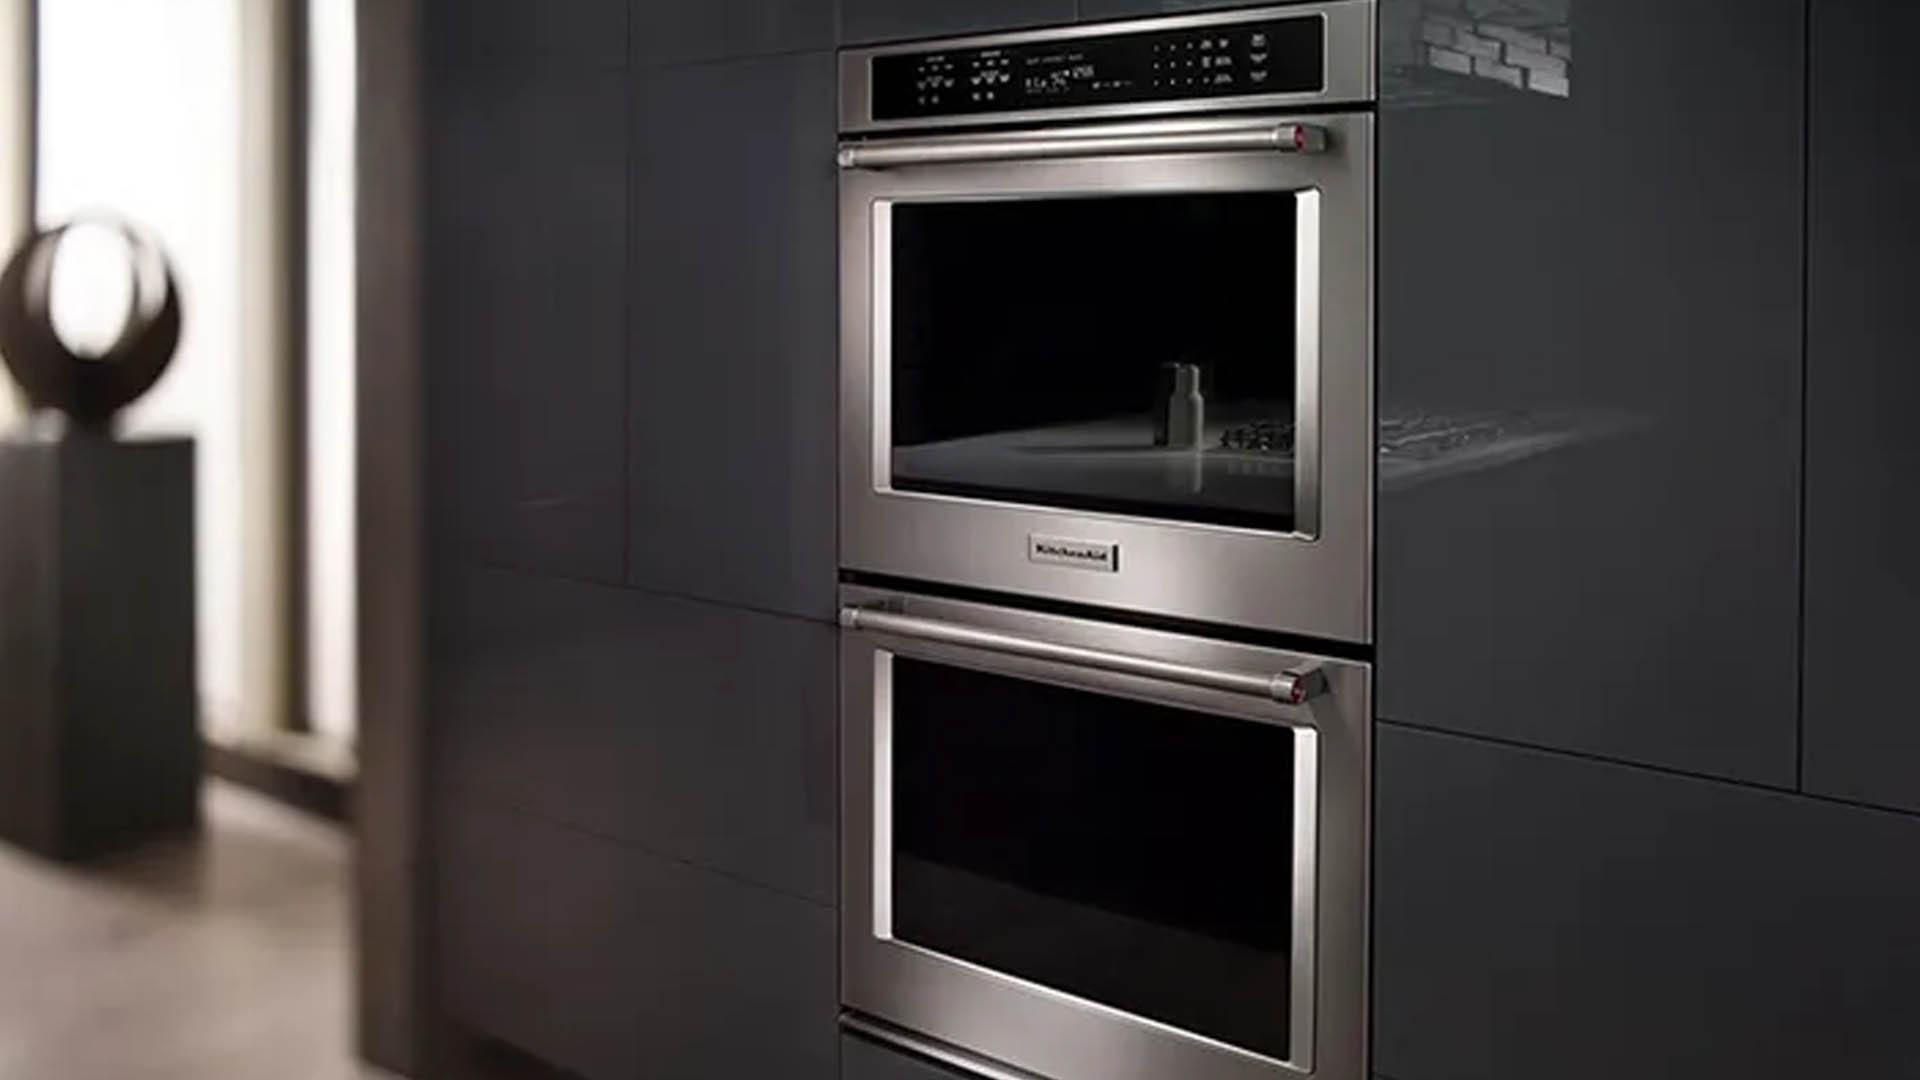 KitchenAid Wall Oven Repair Service | KitchenAid Repairs